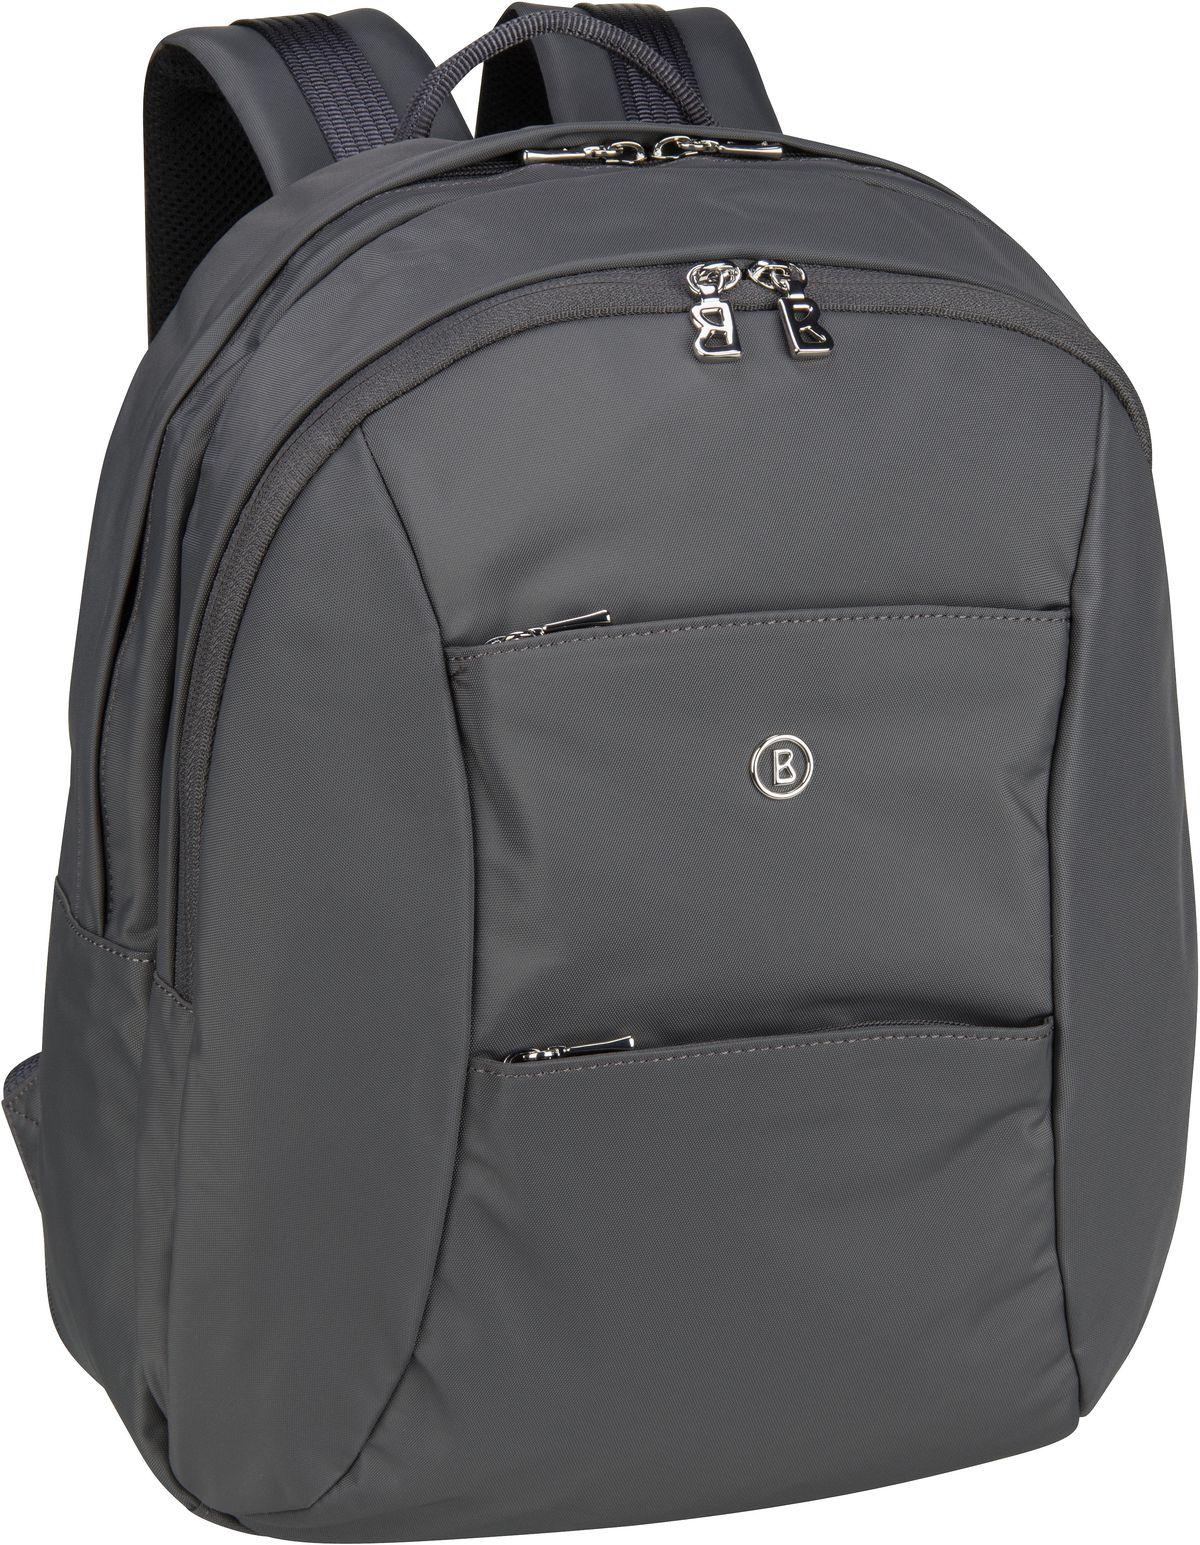 Rucksack / Daypack Verbier Arnt BackPack SVZ Dark Grey